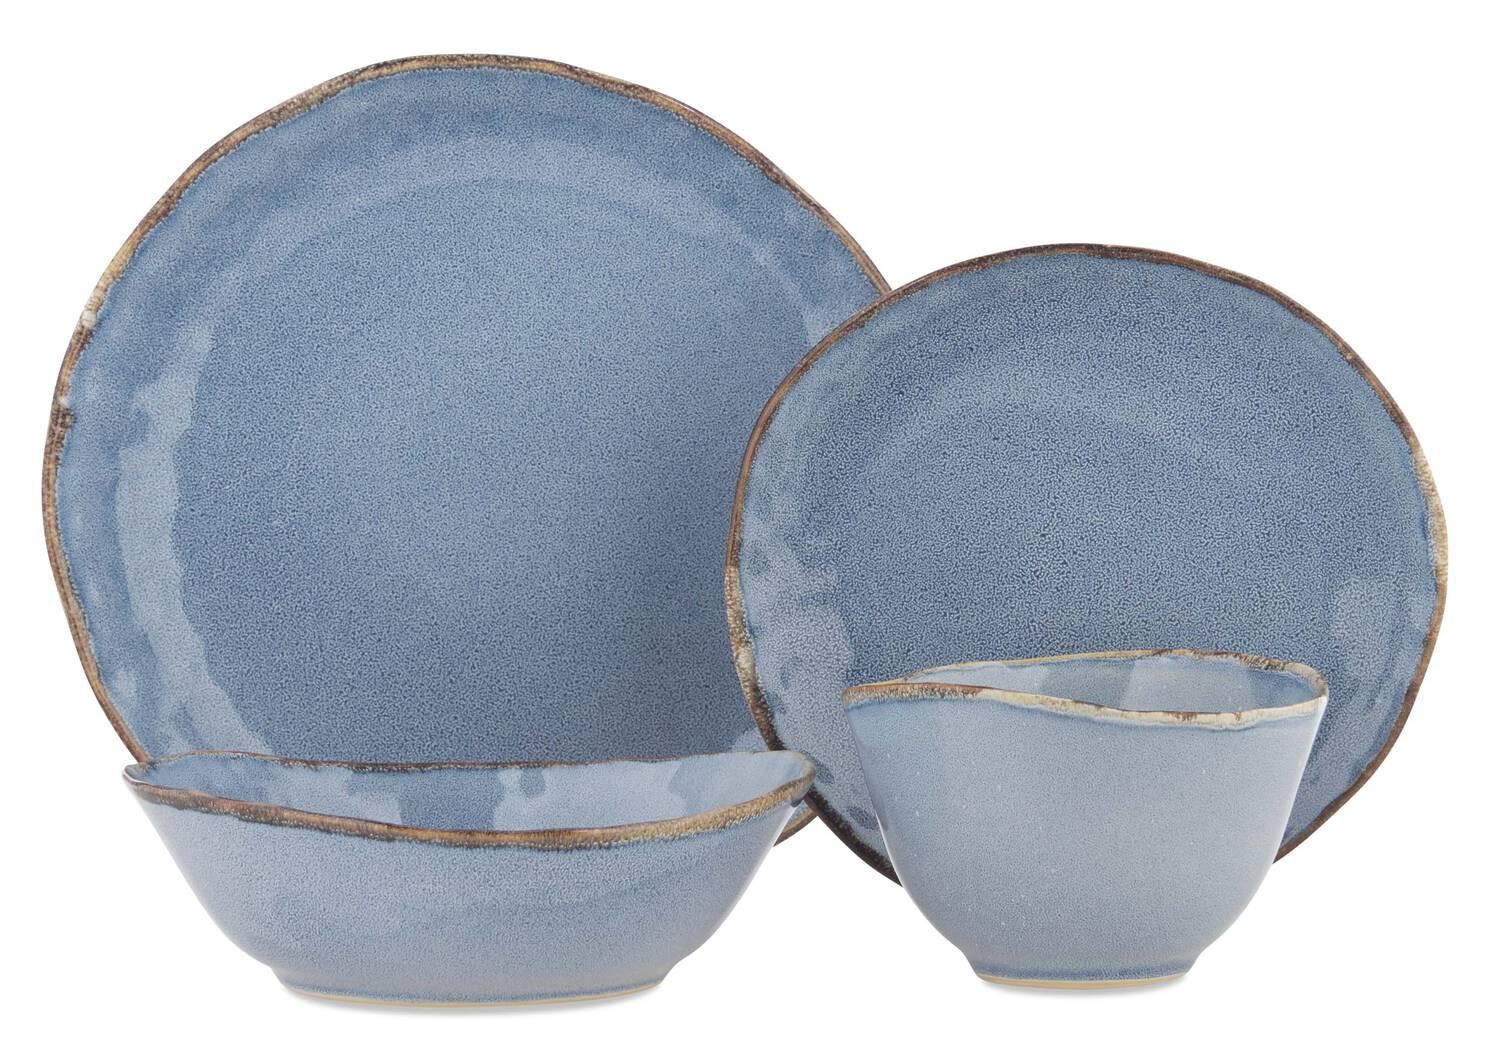 Crofton Glazed 16pc Dish Set Blue